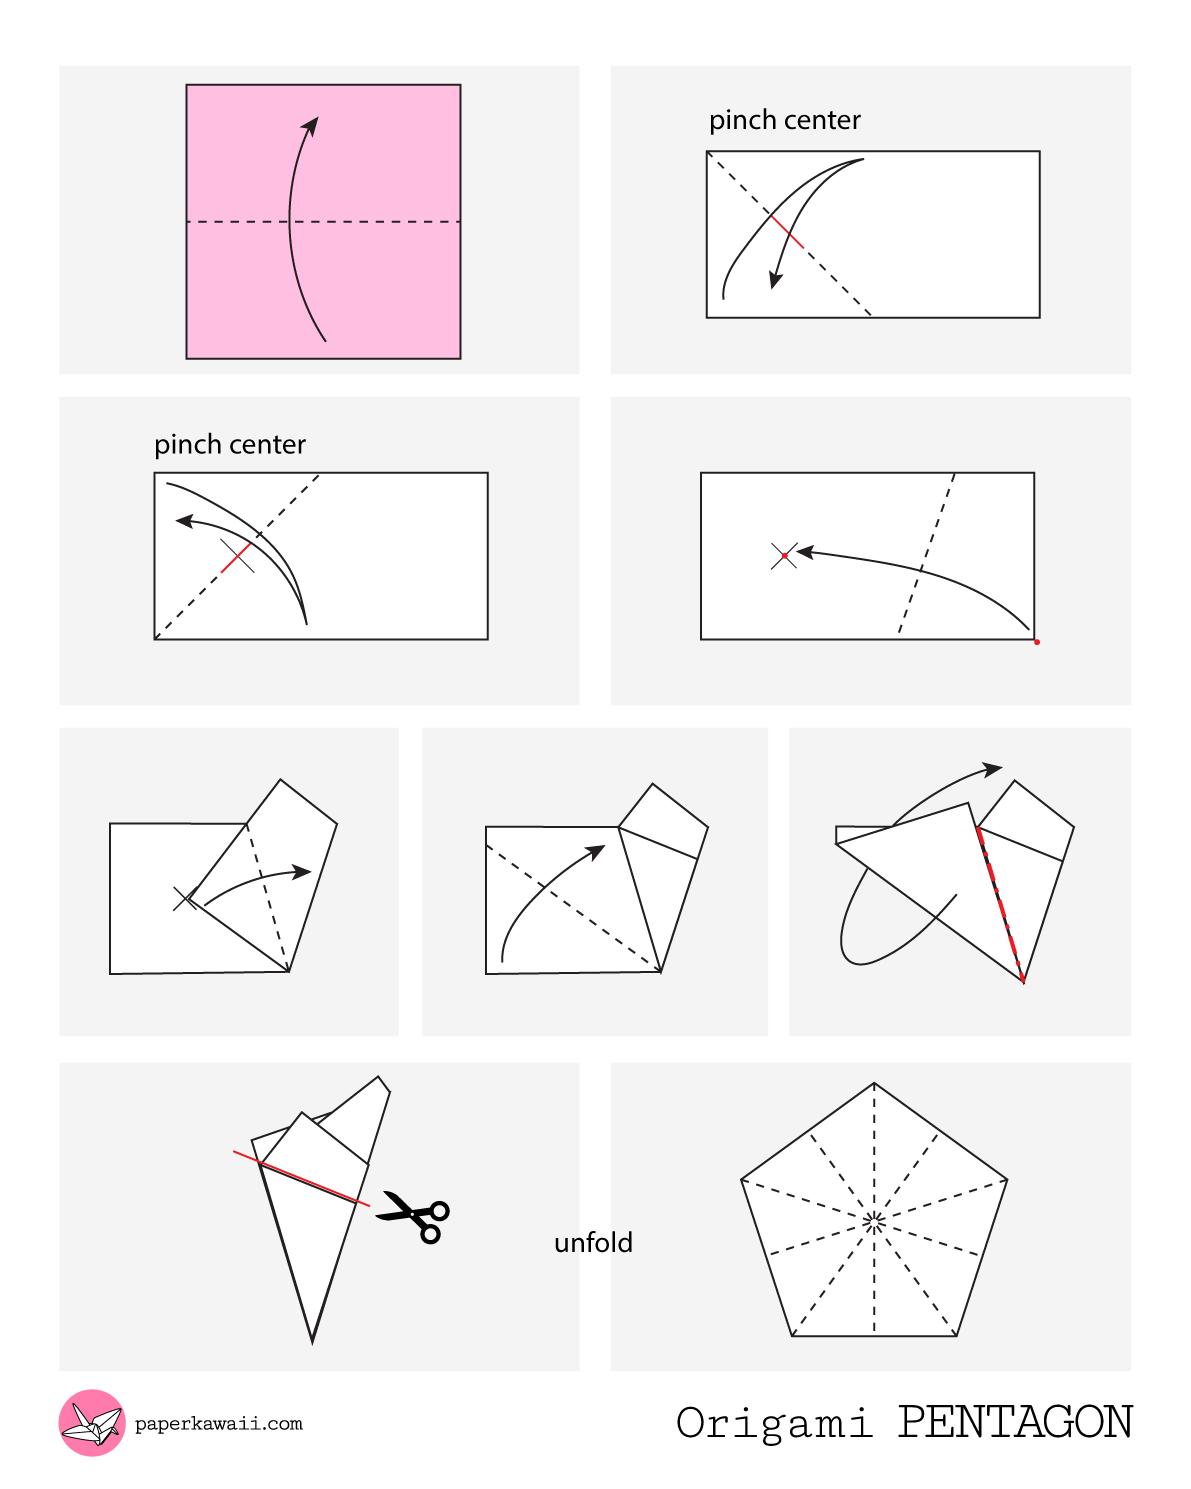 How to make an origami Pentagon - Diagram